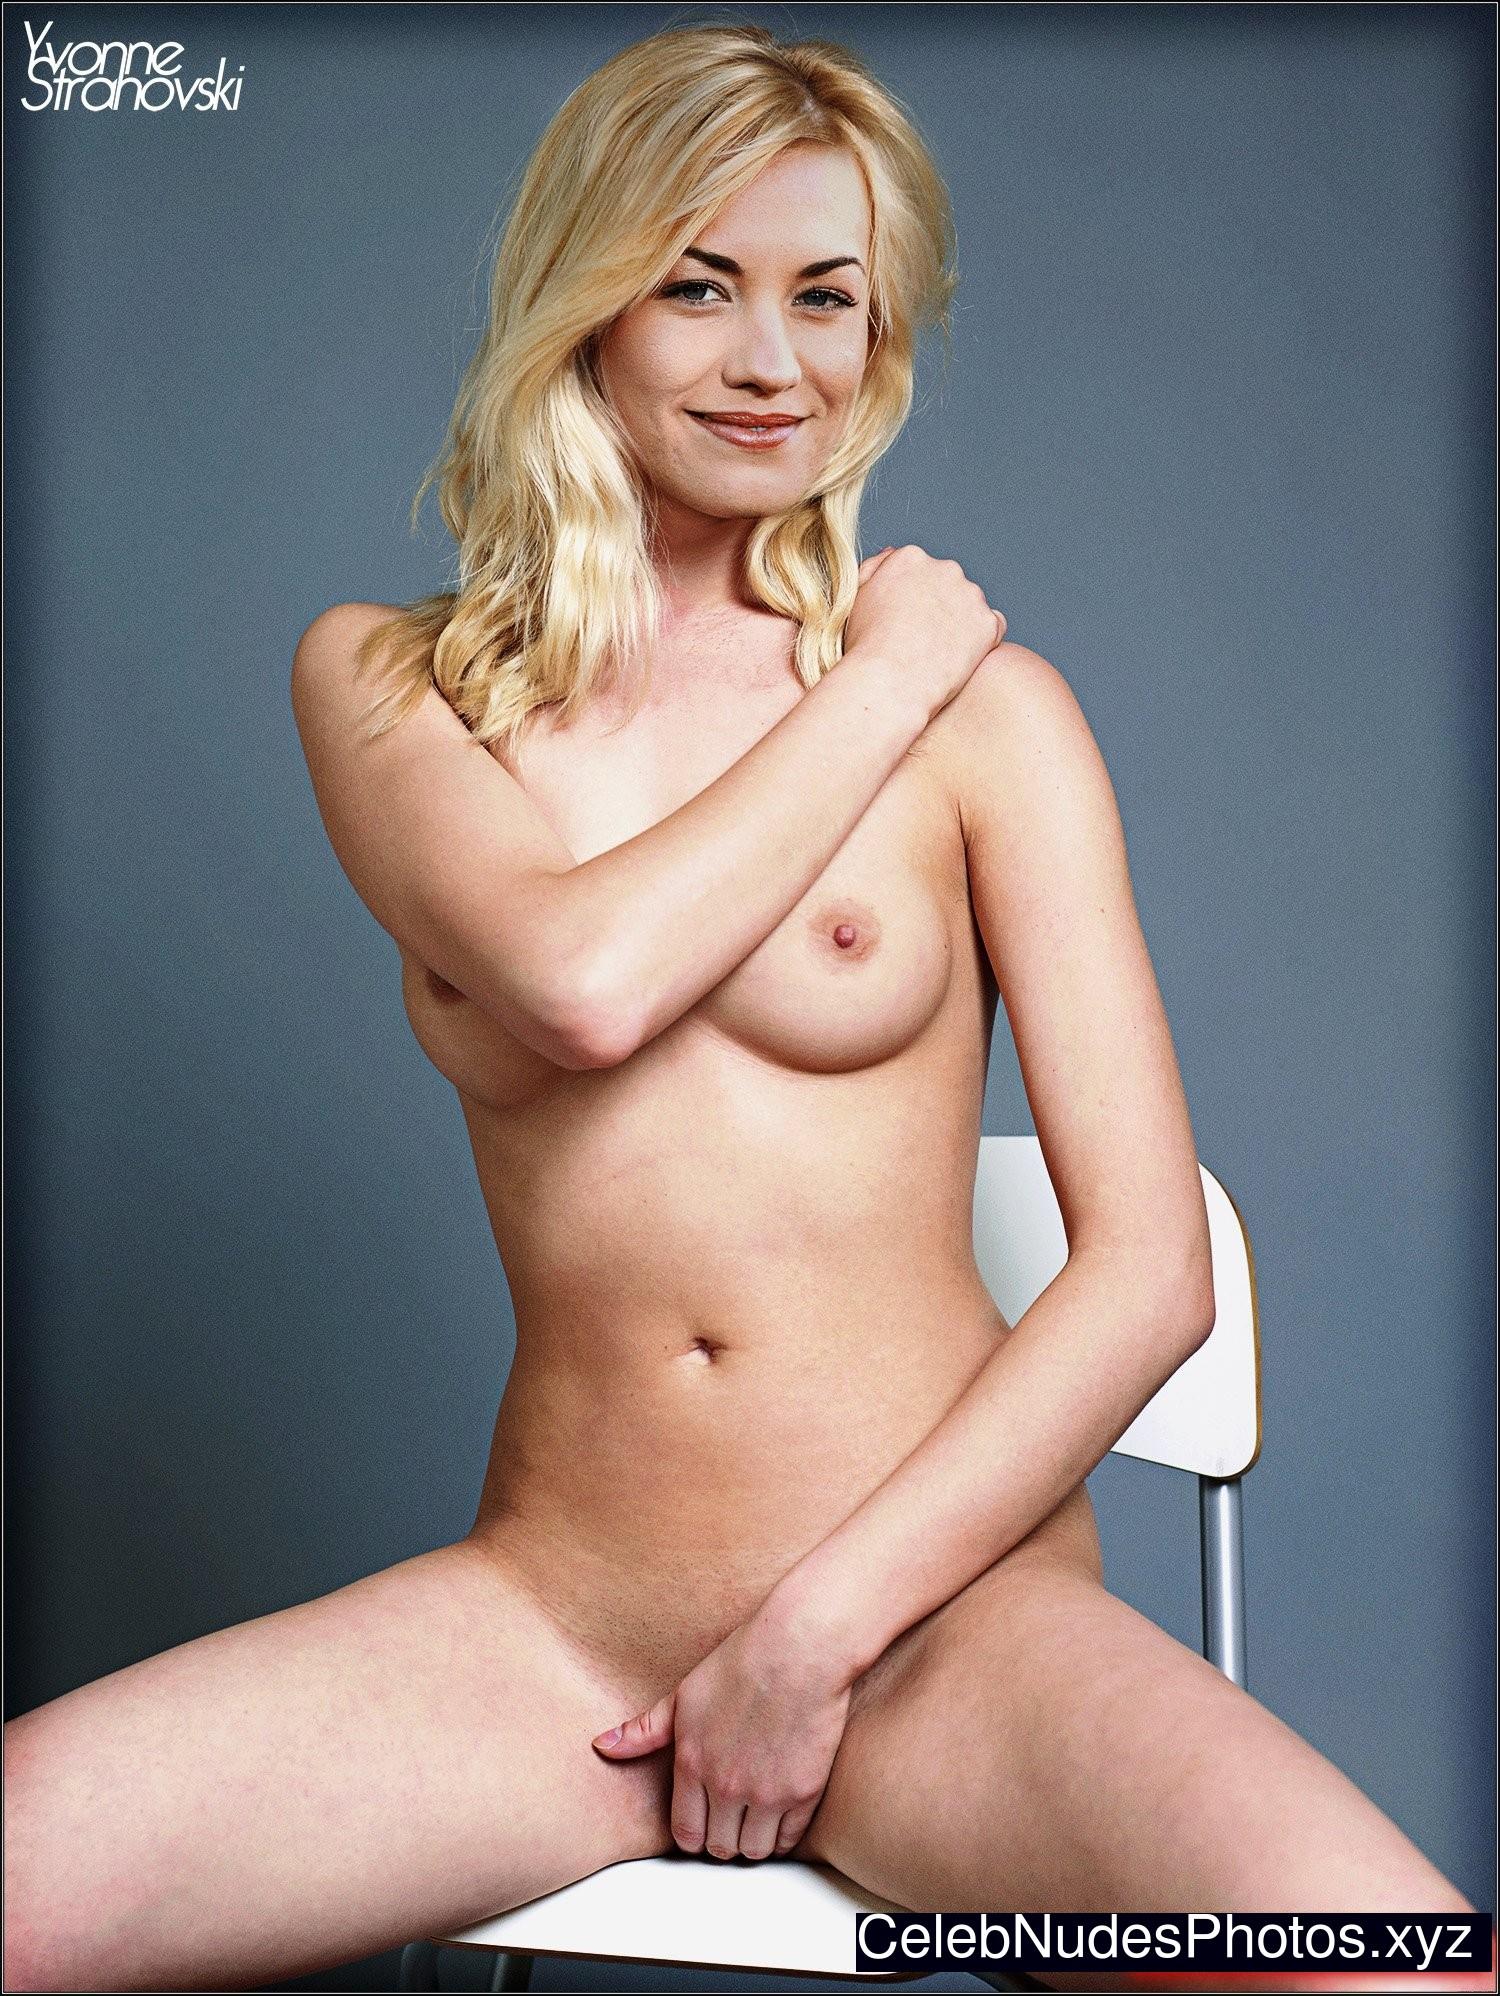 Real nude celebrities